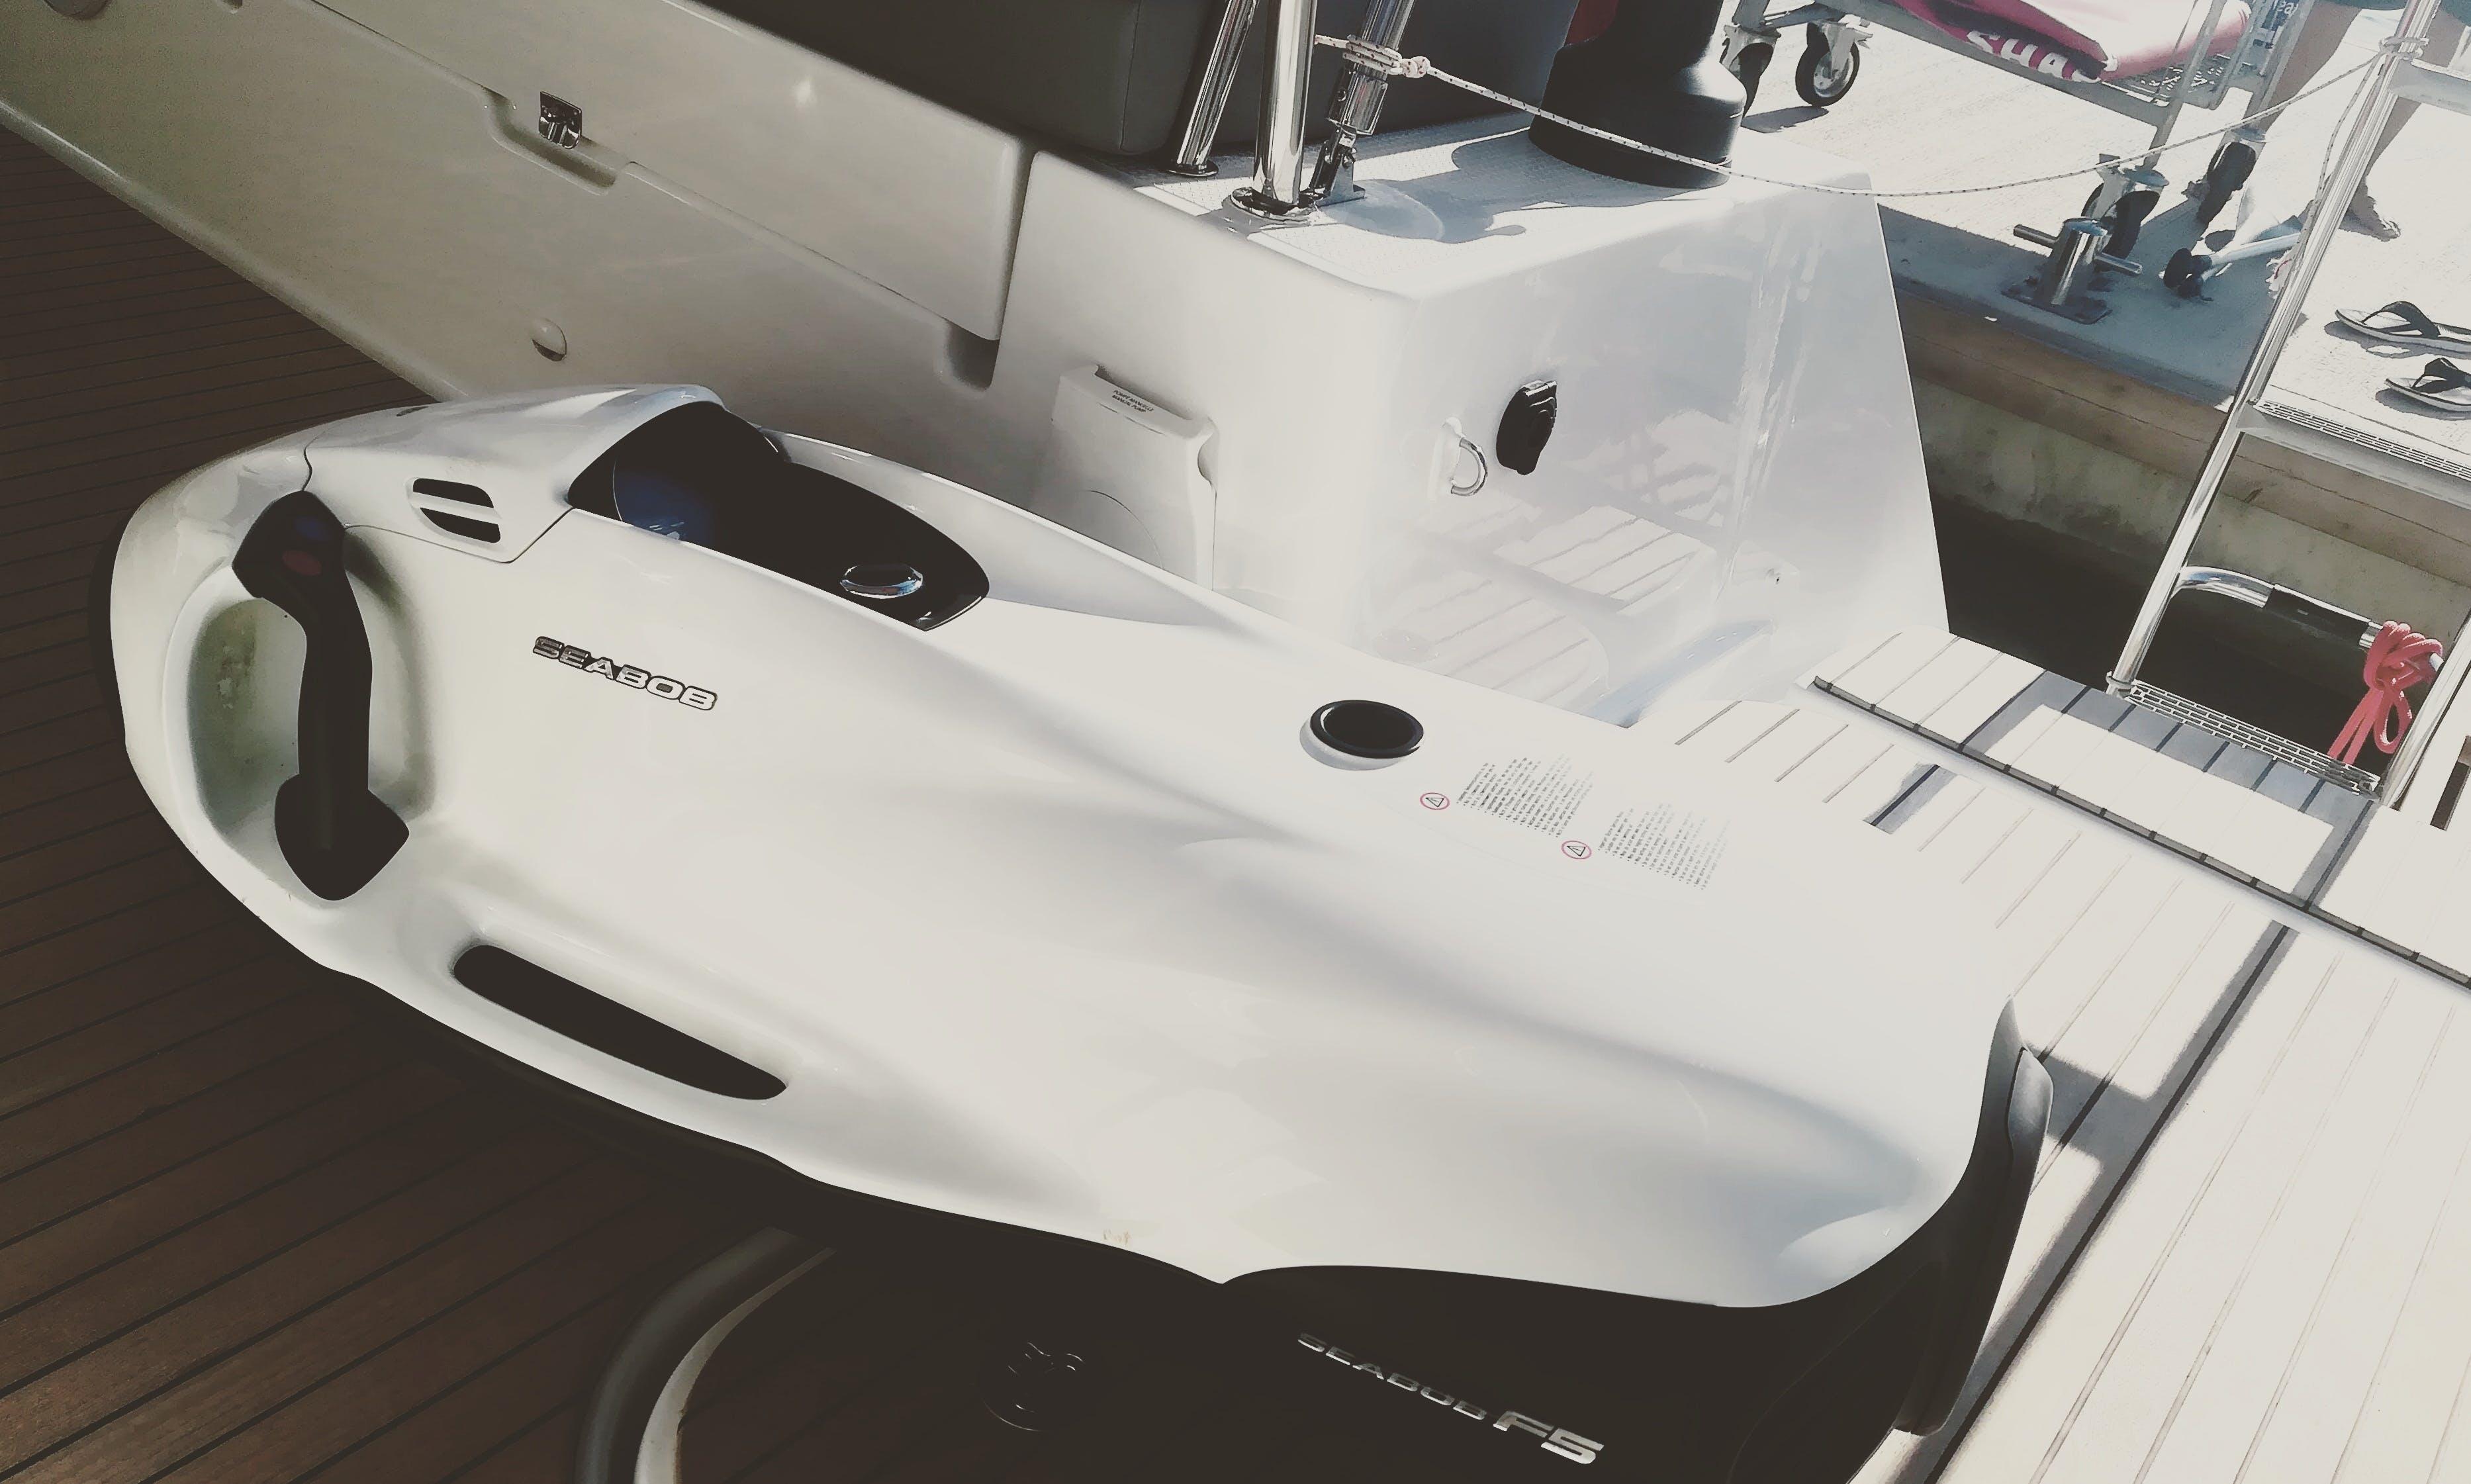 Seabob F5 Watercraft Rental in Split, Croatia